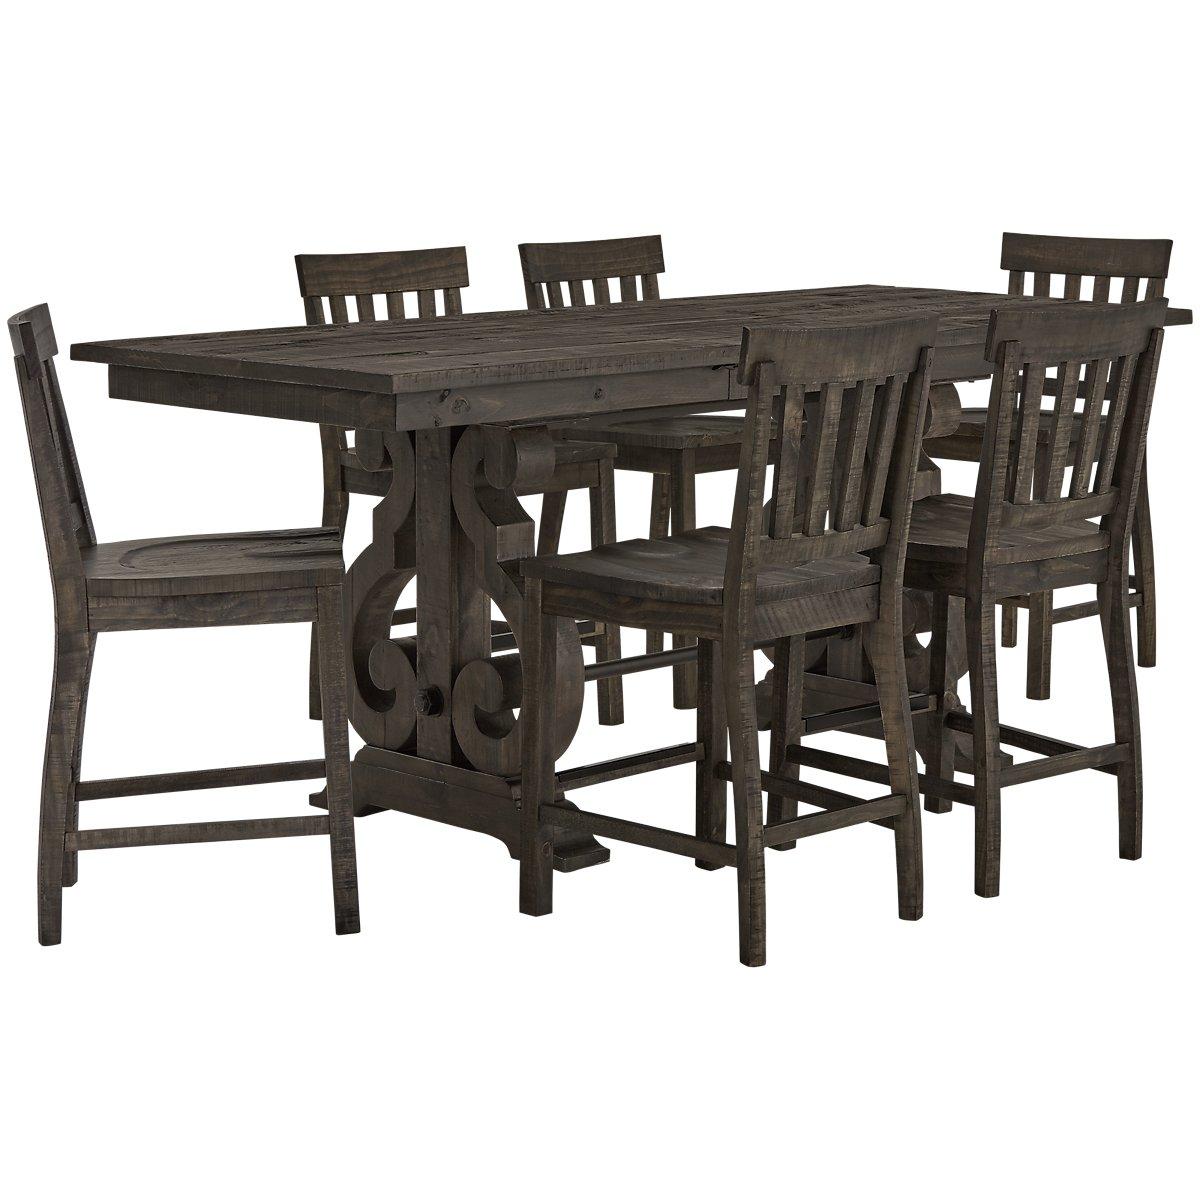 Sonoma Dark Tone High Table & 4 Barstools